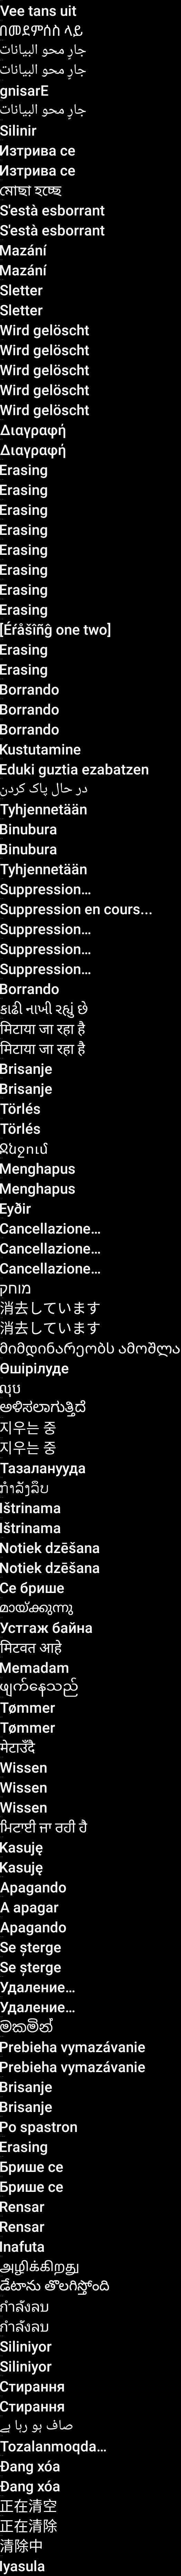 res-xxhdpi/images/erasing_text.png